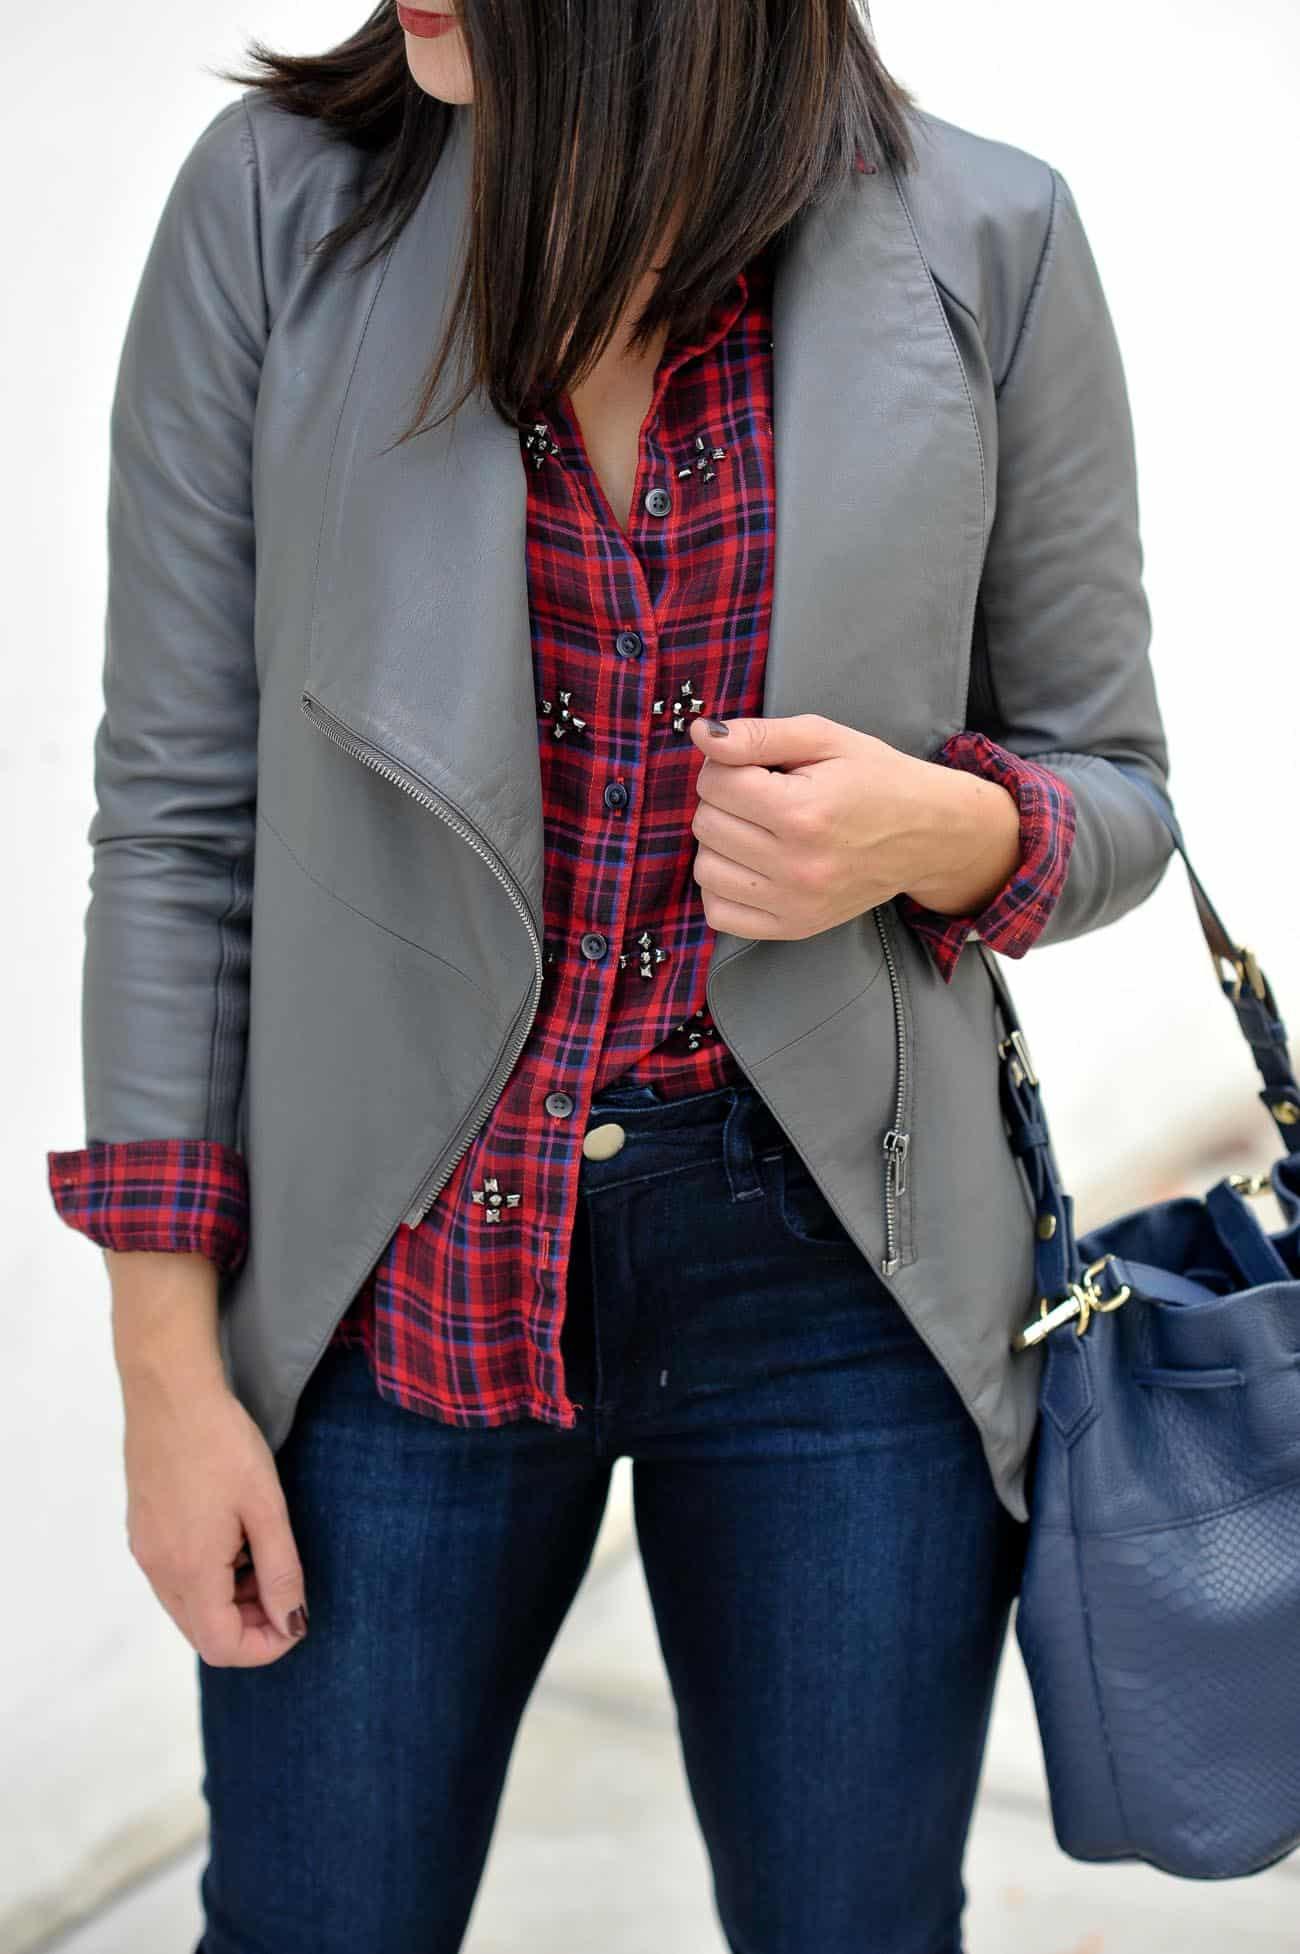 leather jacket and plaid shirt, fall outfits - My Style Vita @mystylevita